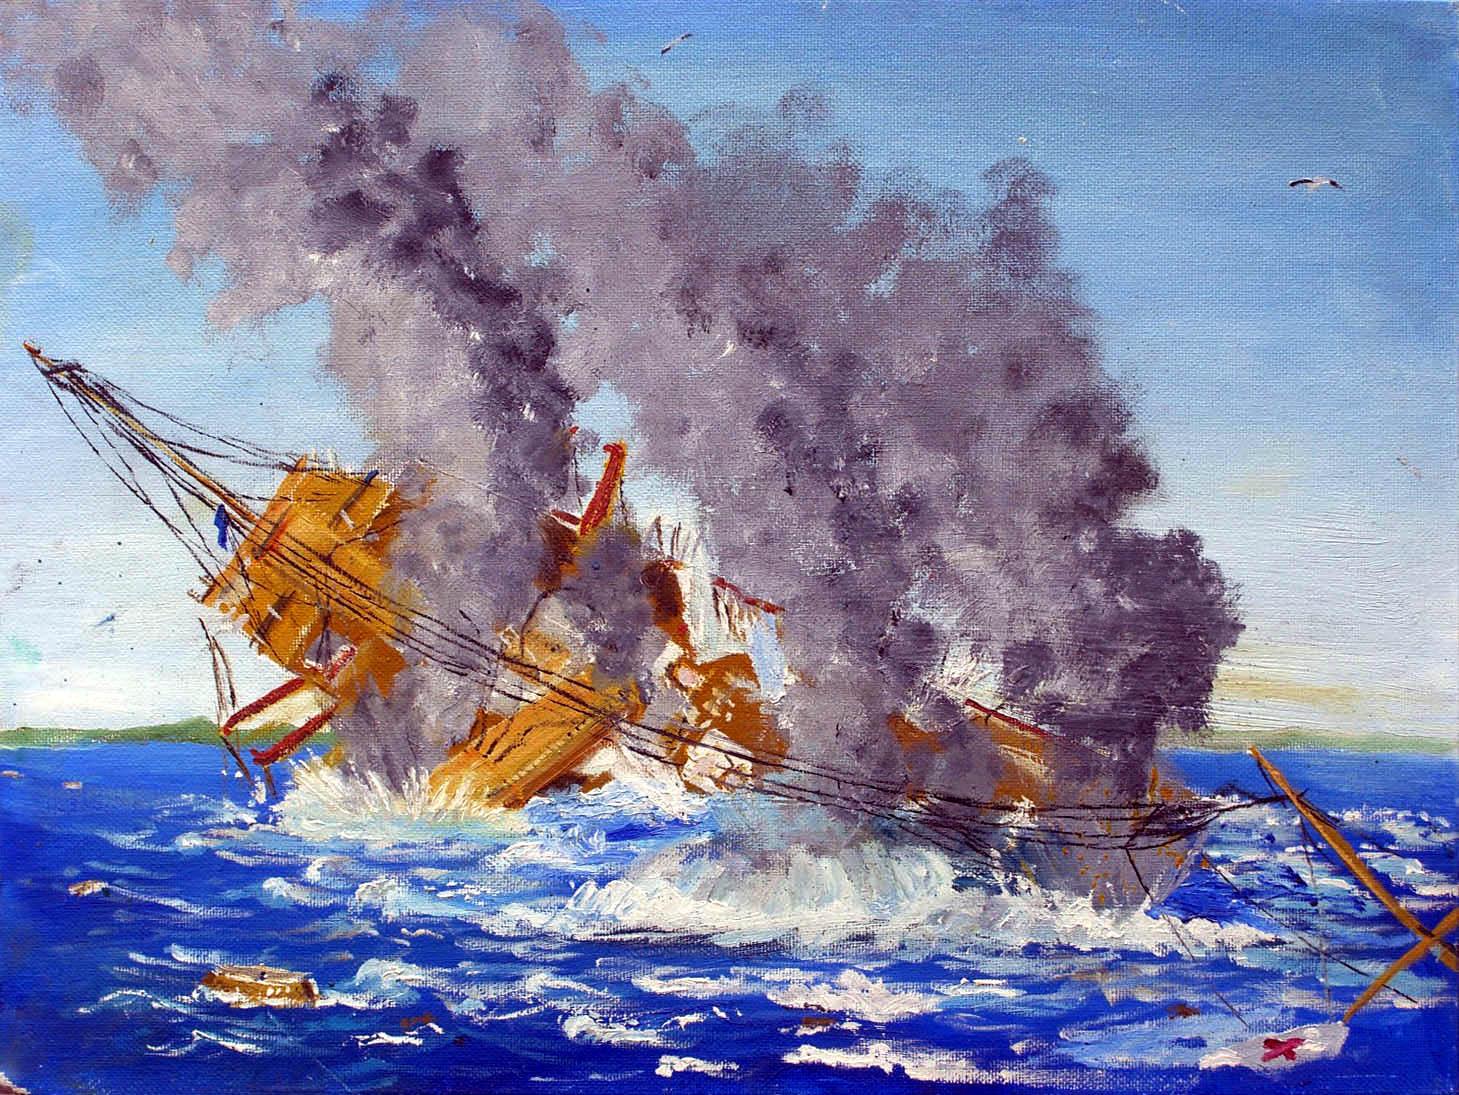 Sinking of the Britannic 3 by rhill555 on DeviantArt